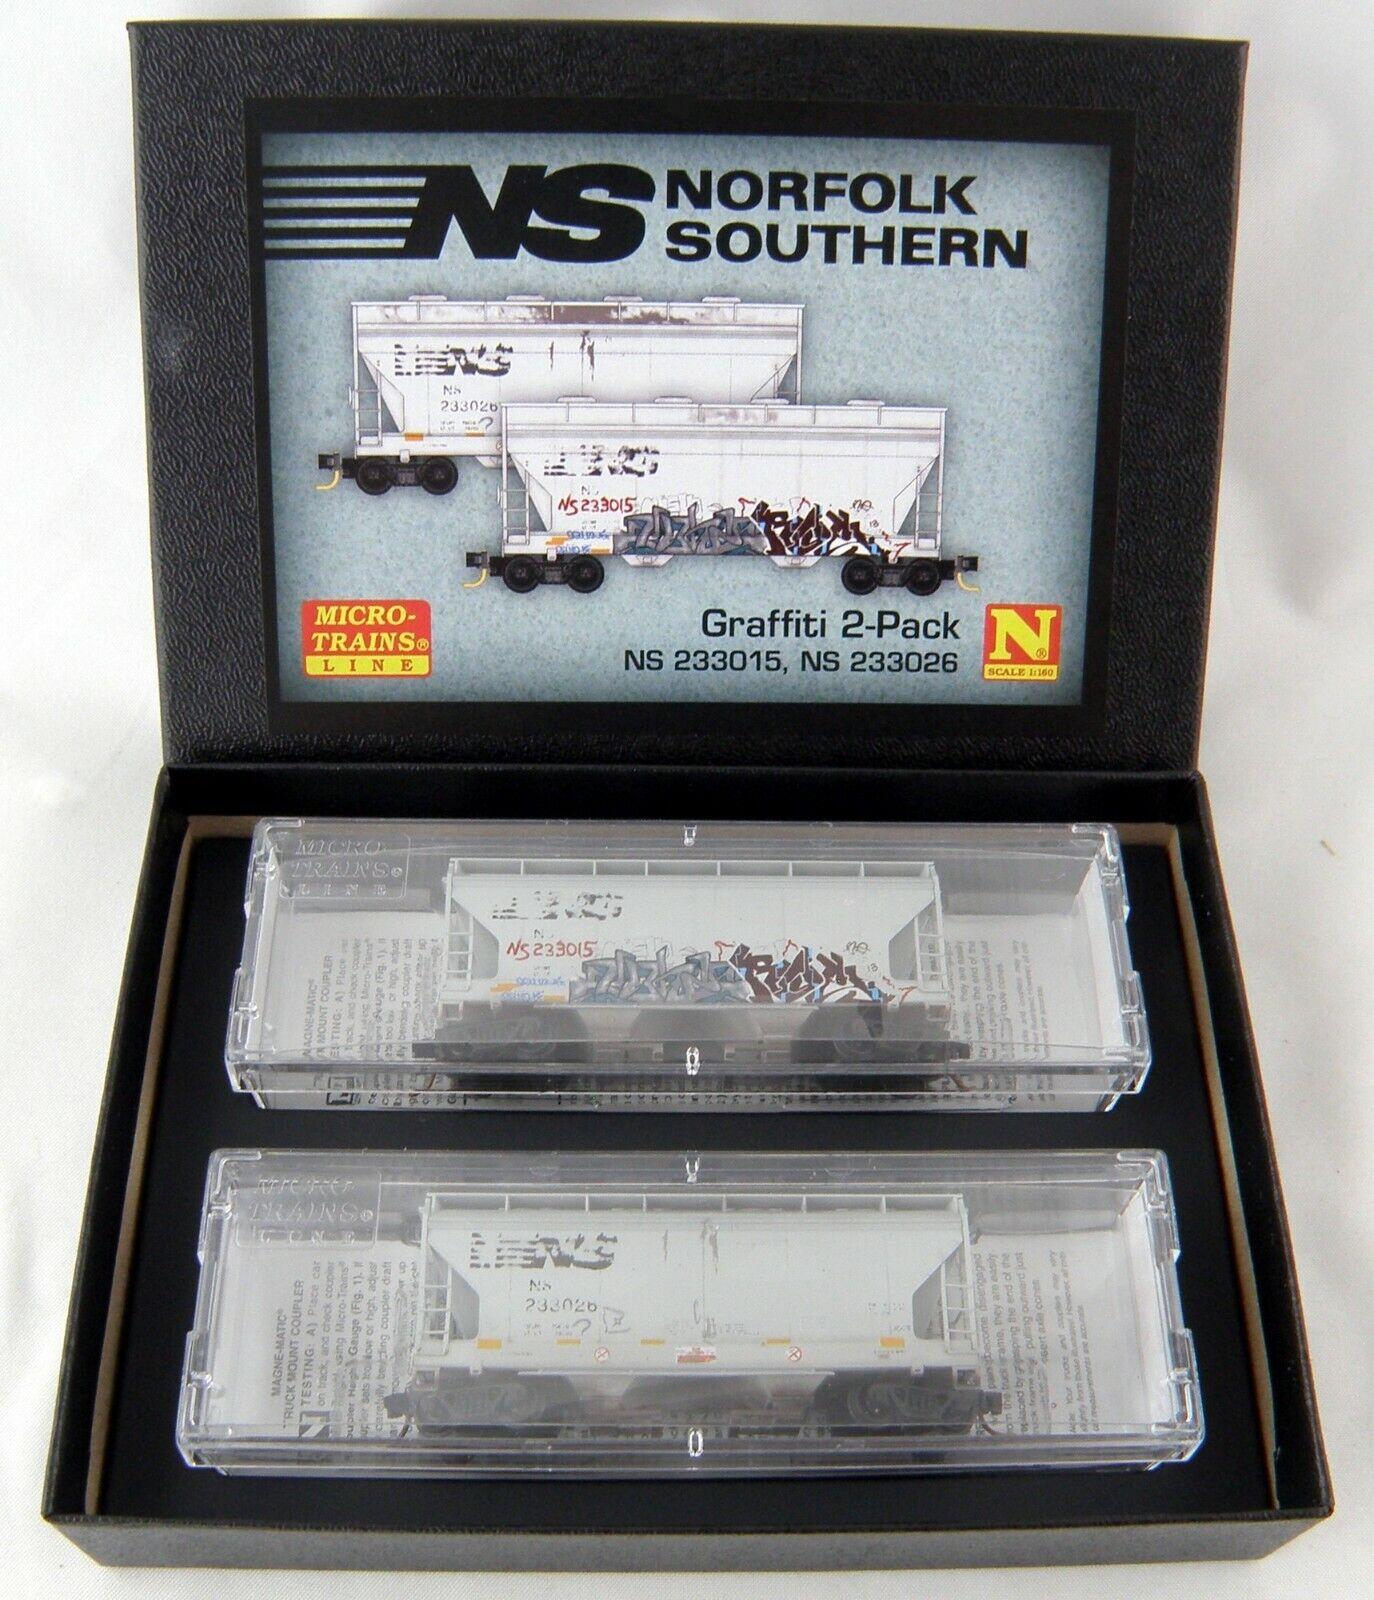 N Scale 2-Bay Covered Hopper (2-Pk) - Norfolk Southern (Graffiti) - MTL 09244460